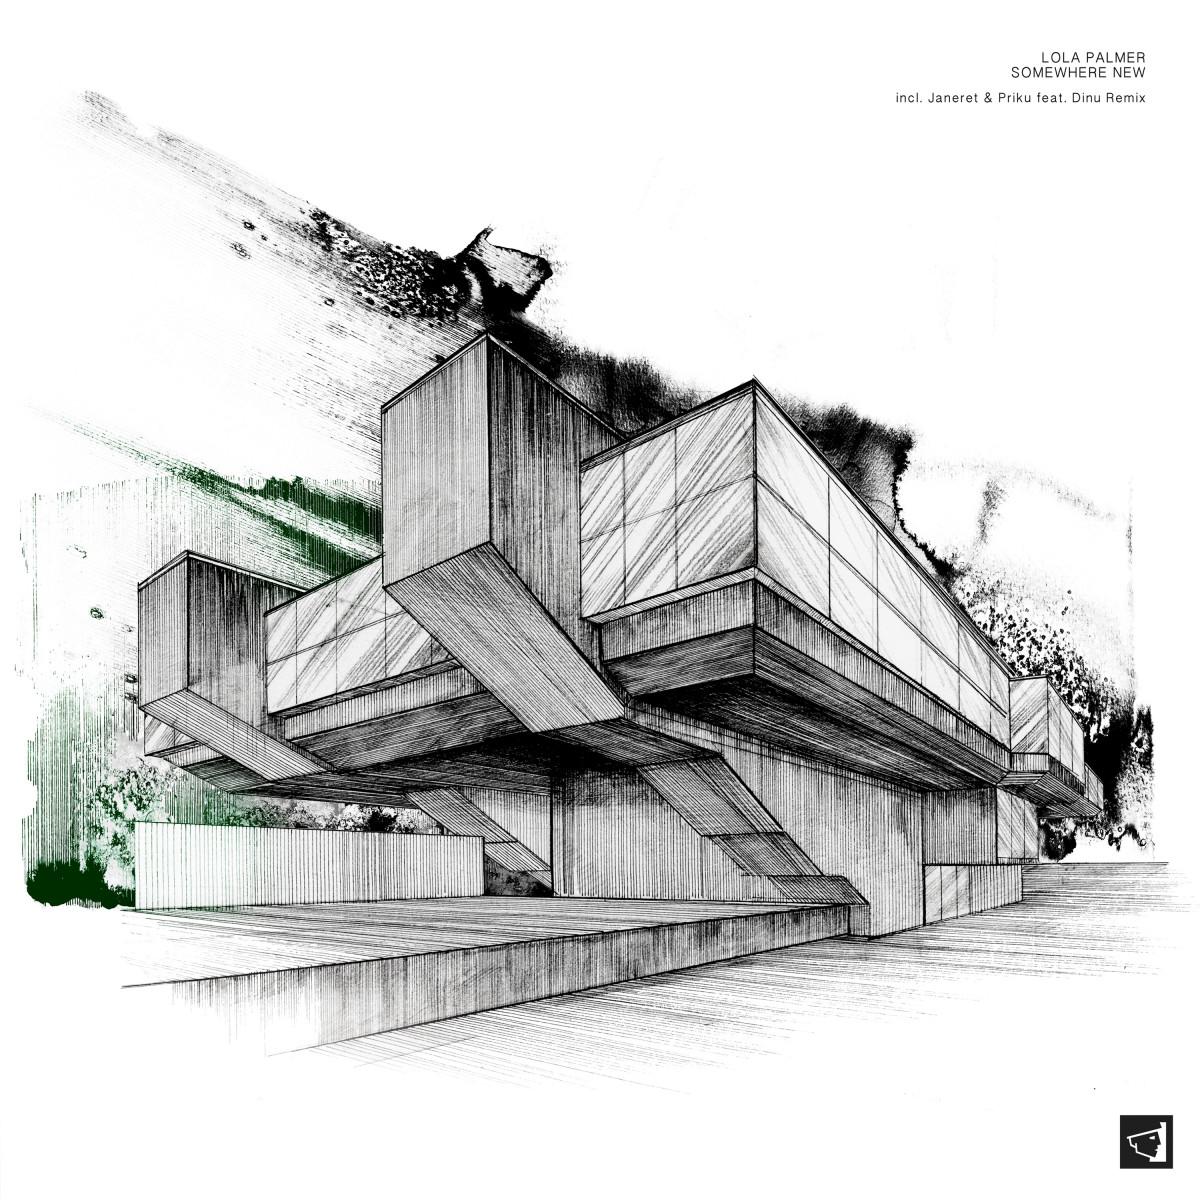 Lola Palmer - Somewhere New EP (incl. Janeret & Priku feat. Dinu) [Berg Audio]